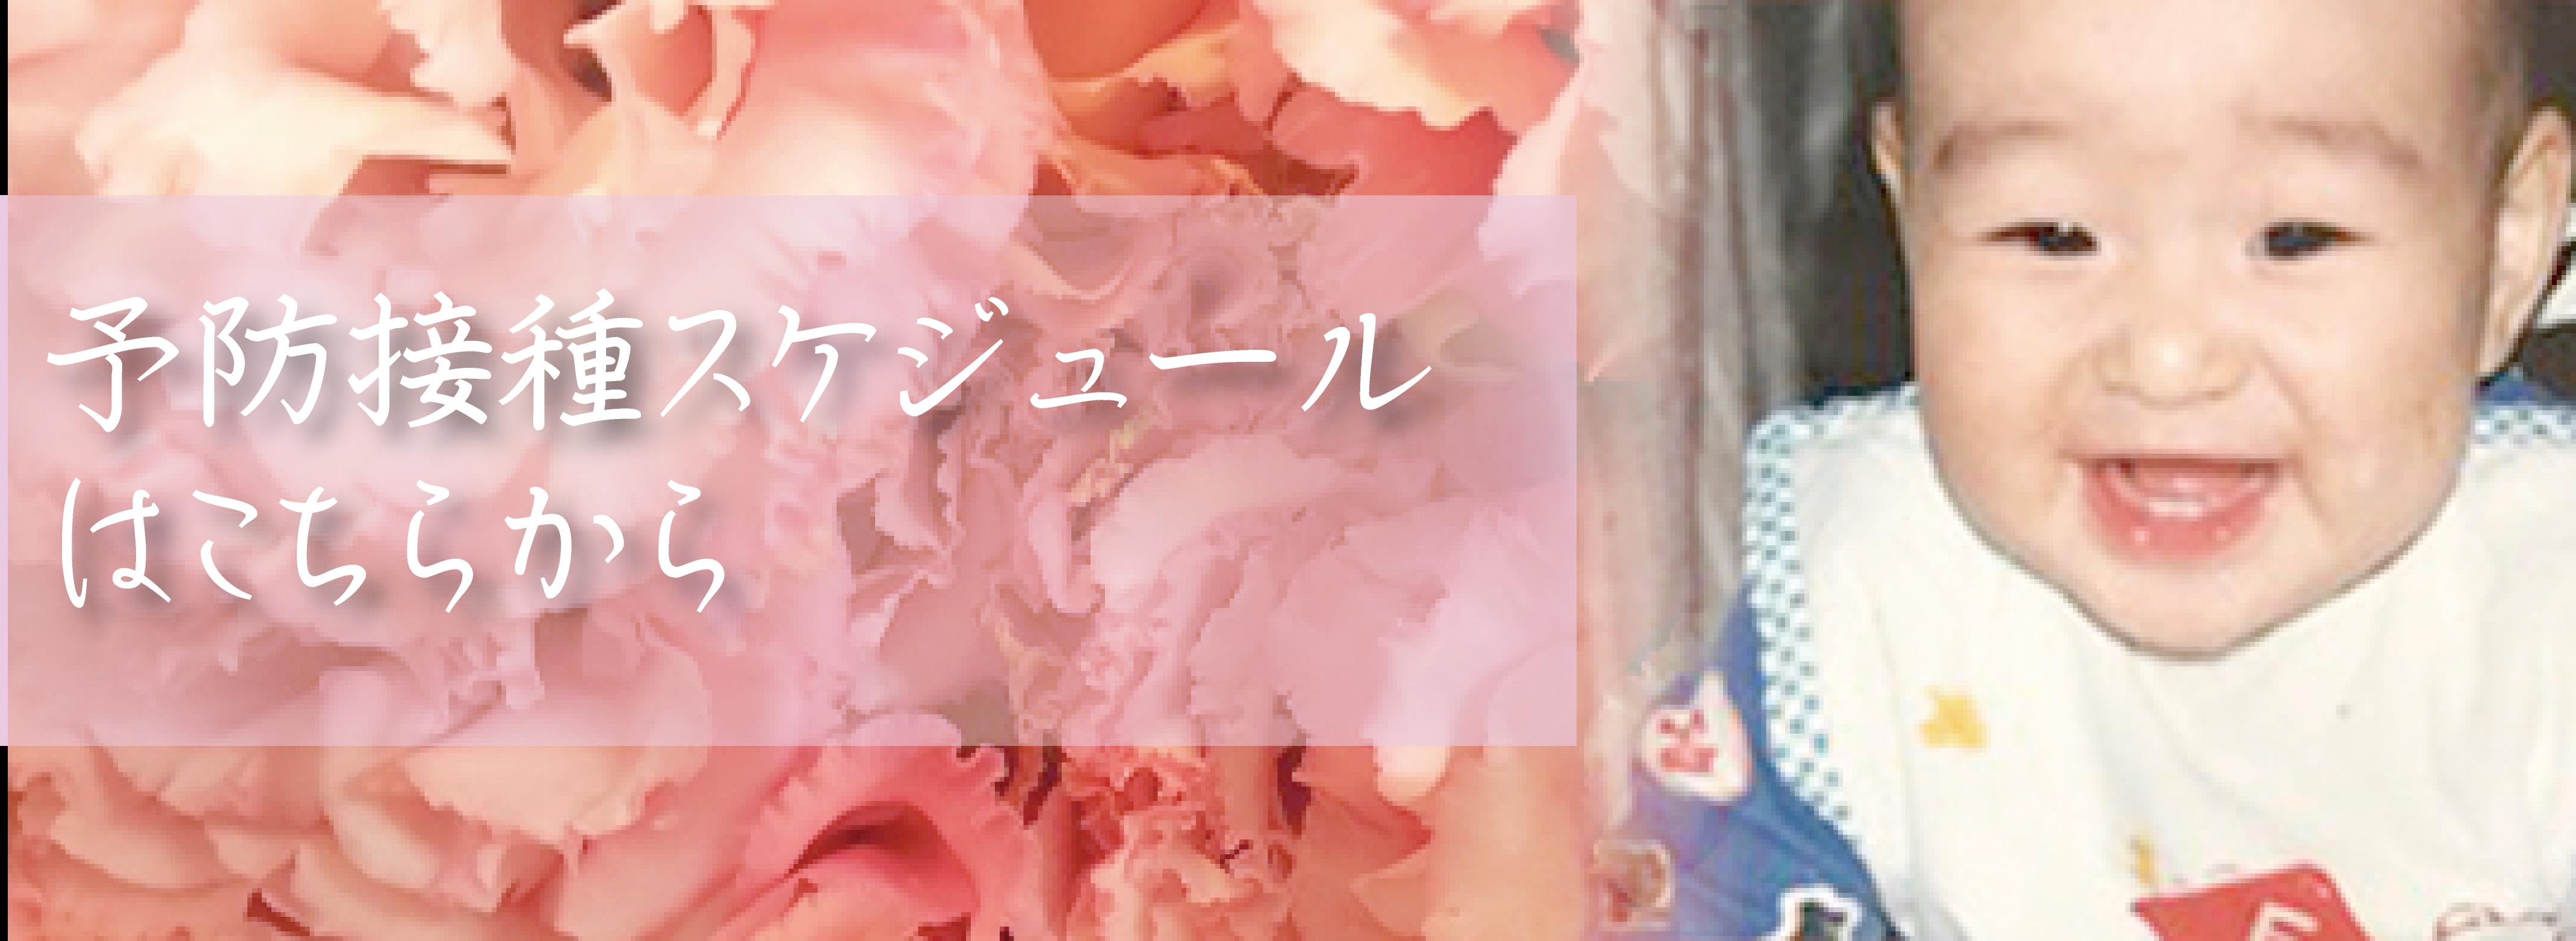 "yehd - <span style=""font-family: serif;"">小児科"